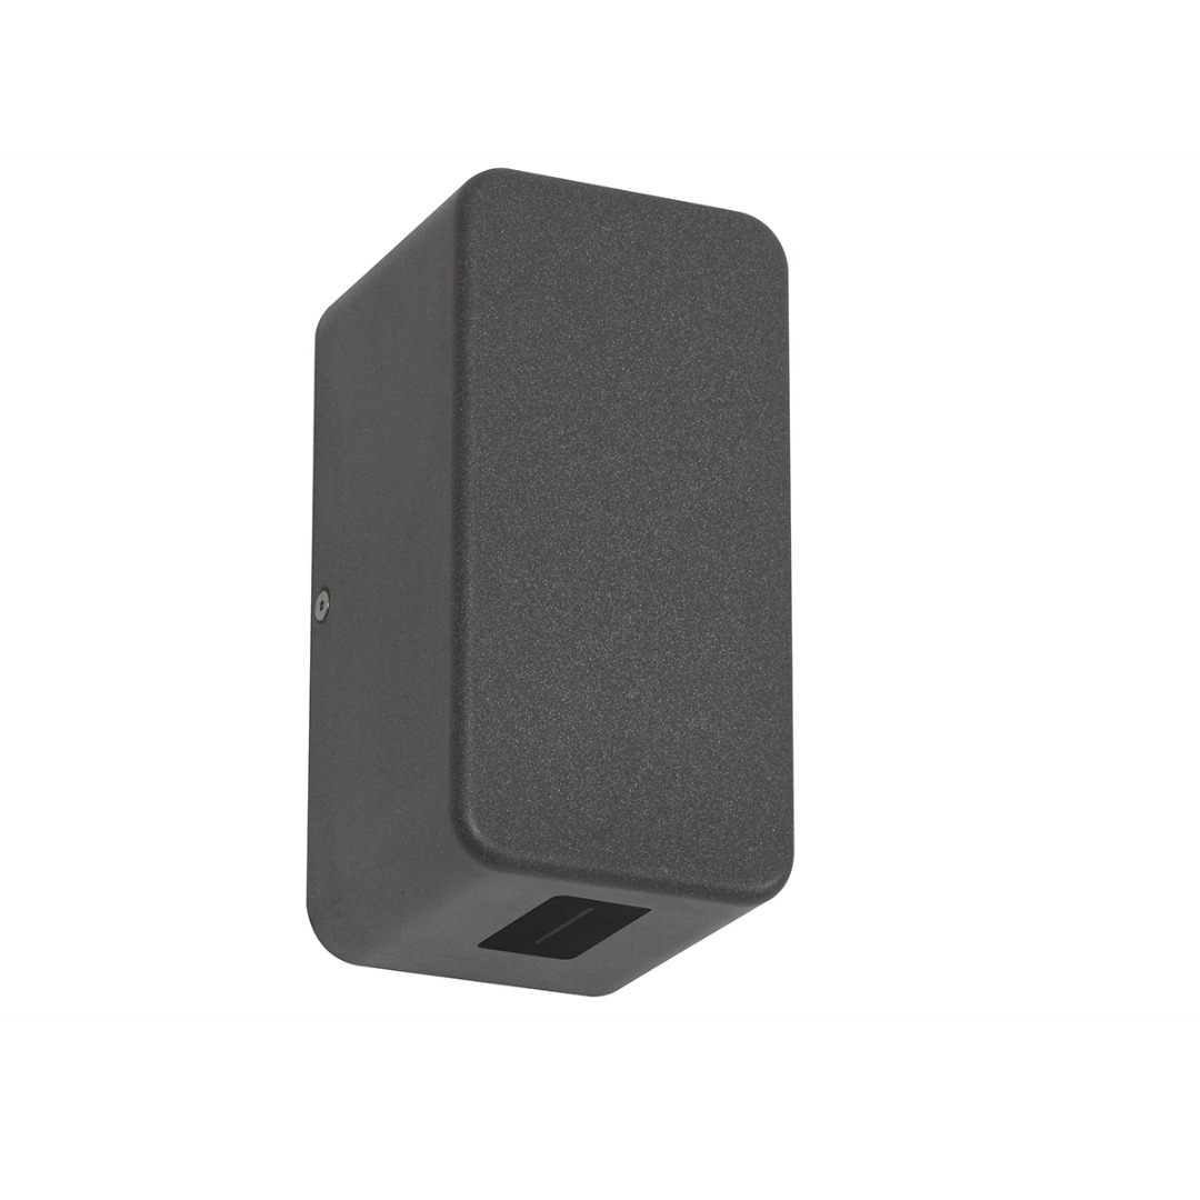 MiniModo V 1LE 180x90